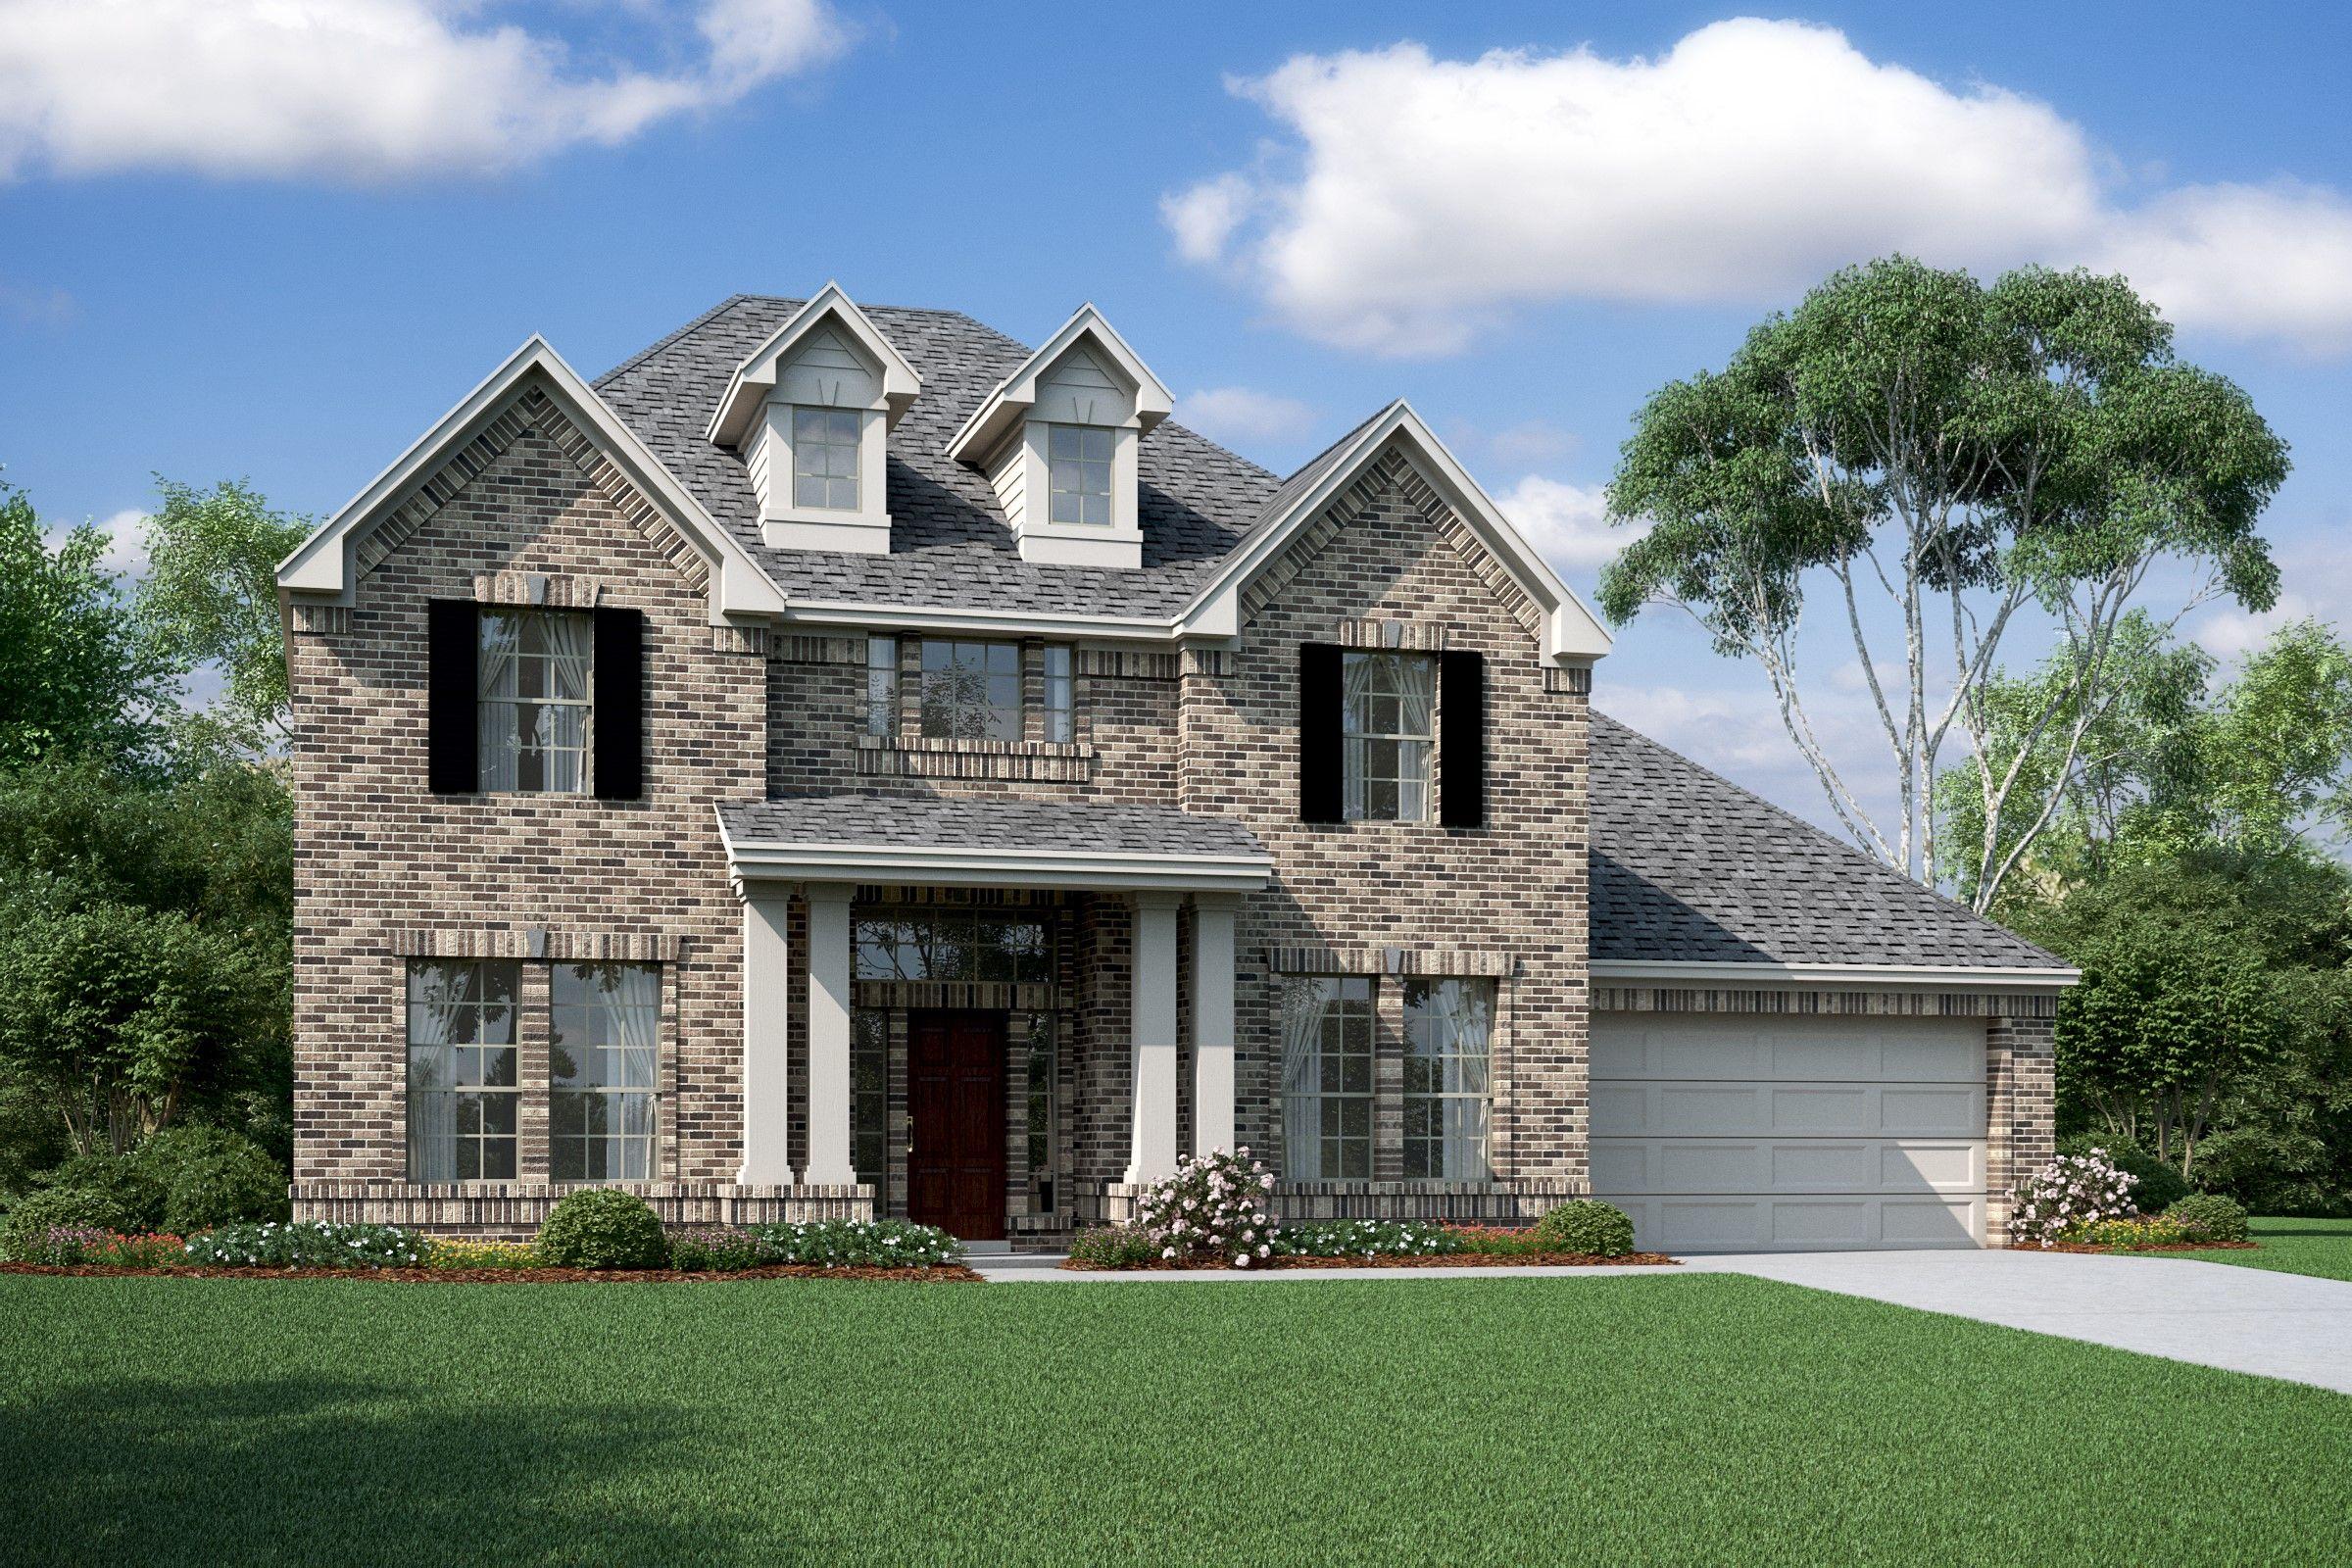 Single Family for Sale at Thunder Bay - Louise Mccollum Park Rd & Thunder Bay Beach City, Texas 77523 United States